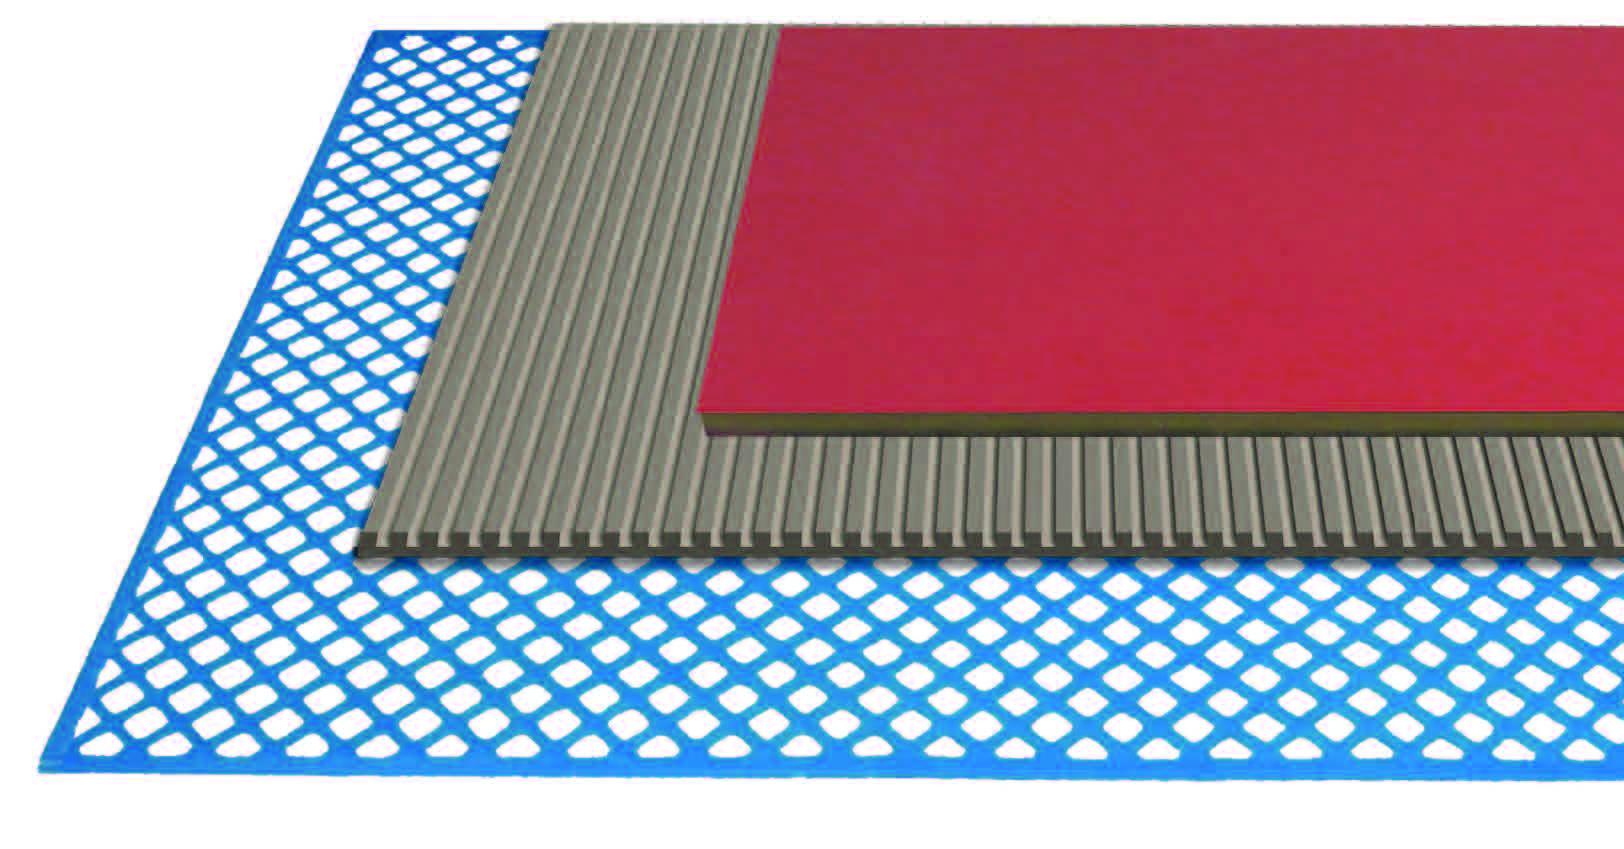 N Amp C Nicobond Plastic Ply N Amp C Tiles And Bathrooms